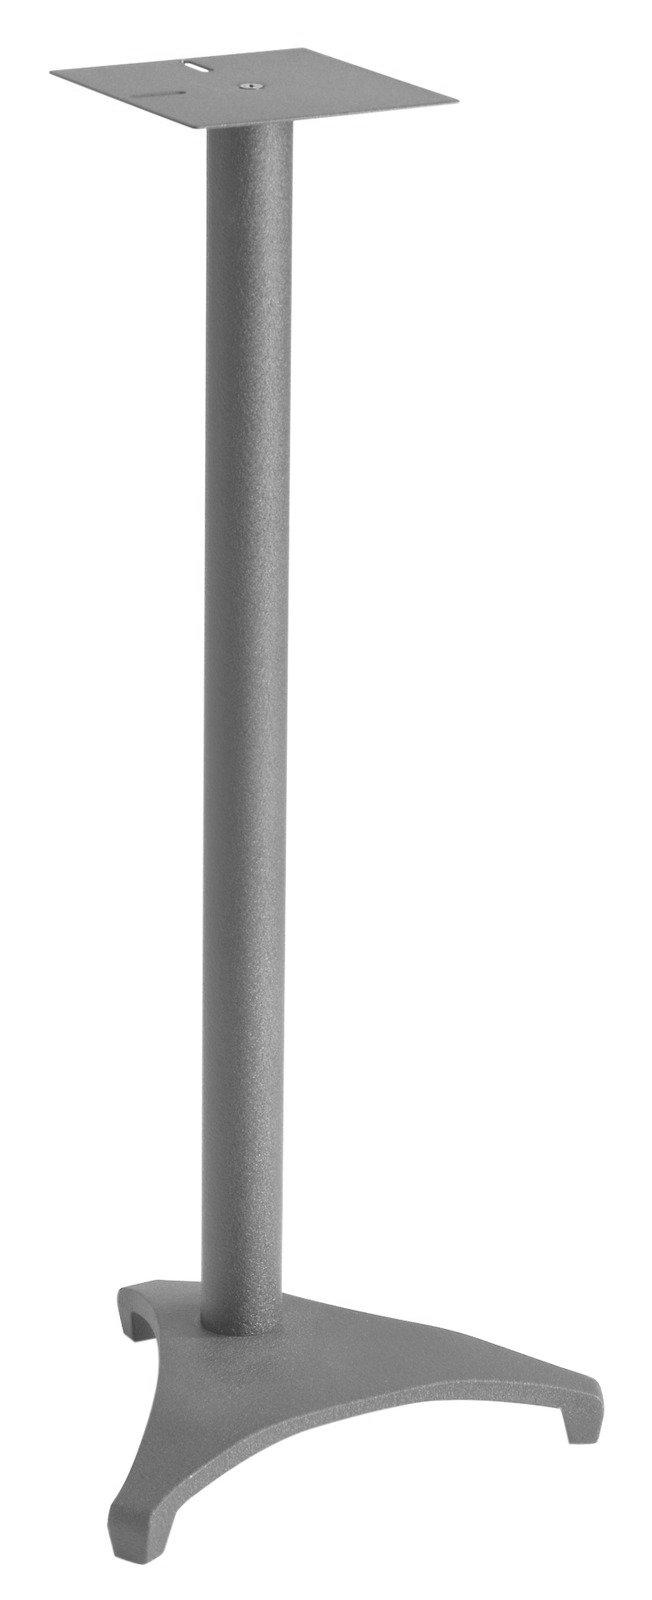 Sanus Systems EF-28B 28 -Inch Euro Foundations Bookshelf Speaker Stands (Black Pair) by Sanus